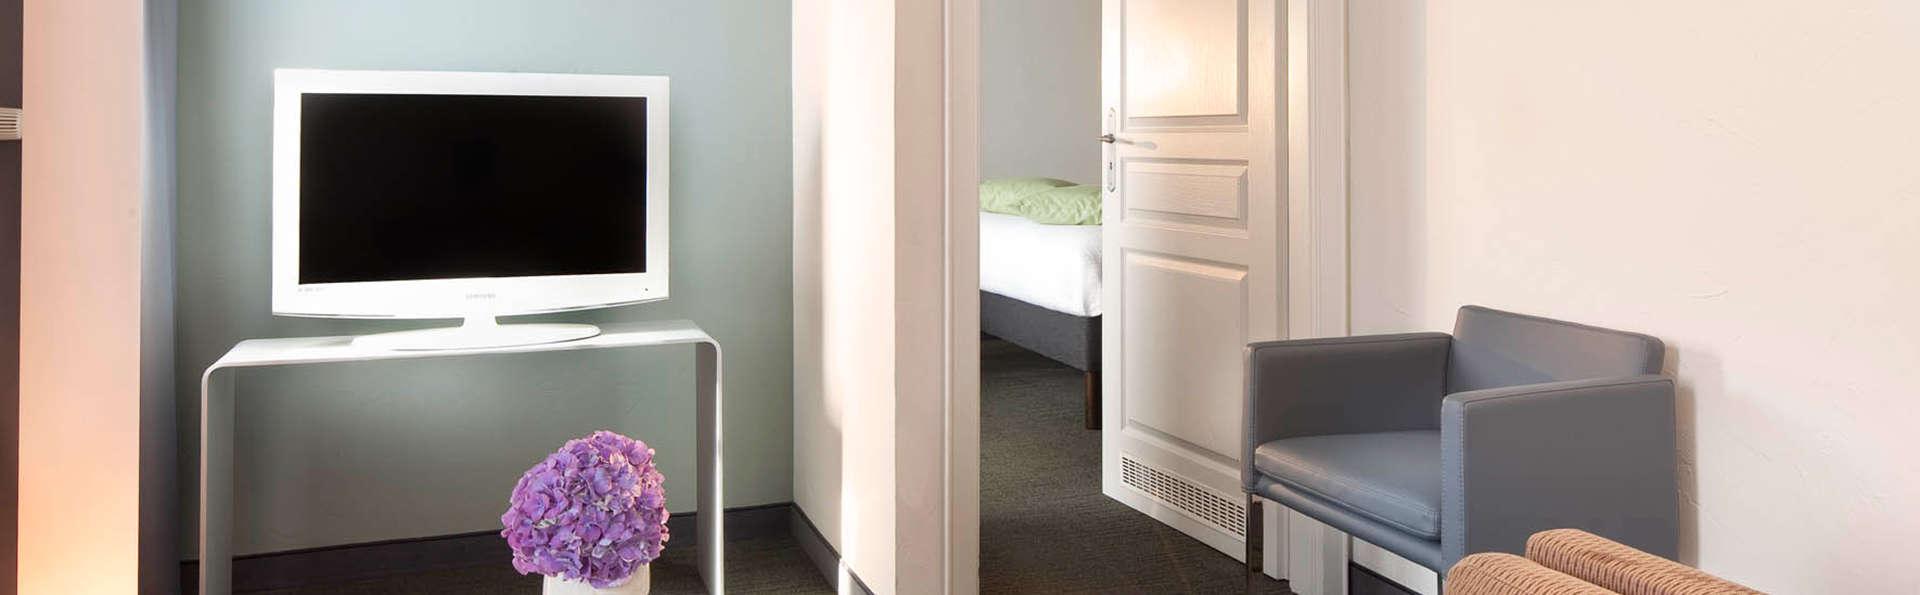 Le Colombier Obernai - edit_room5.jpg